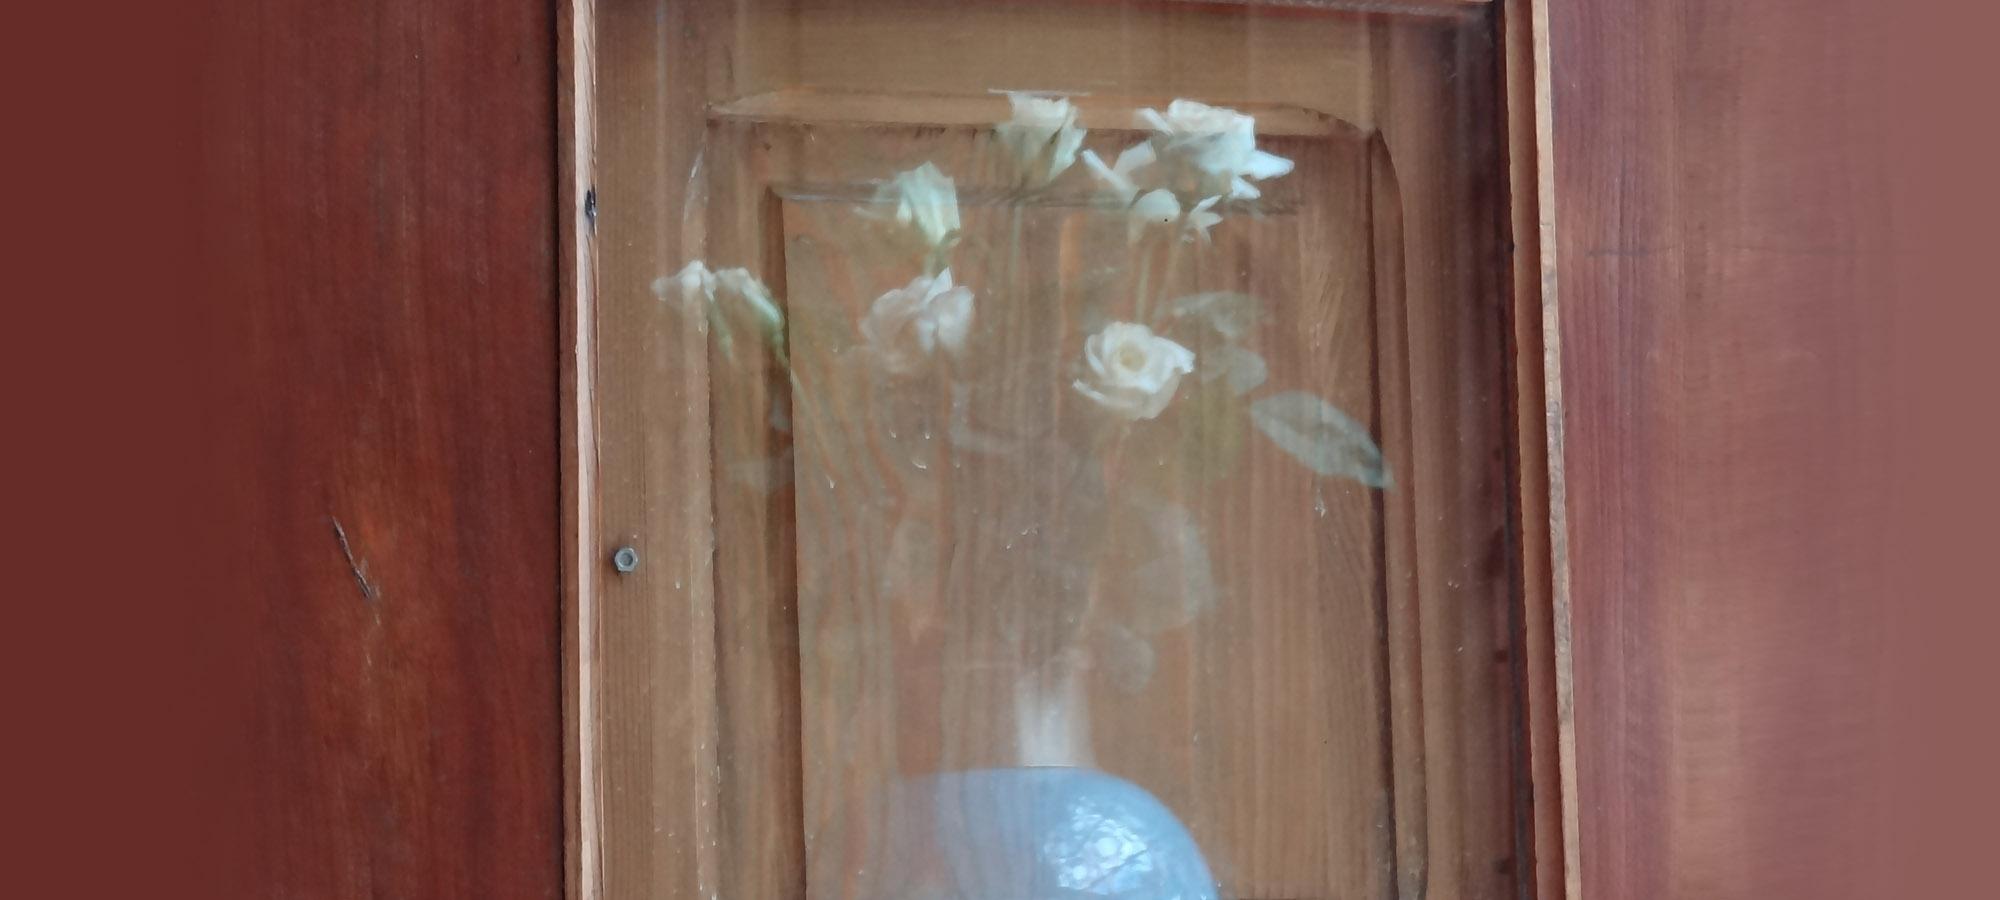 Reflecting Roses